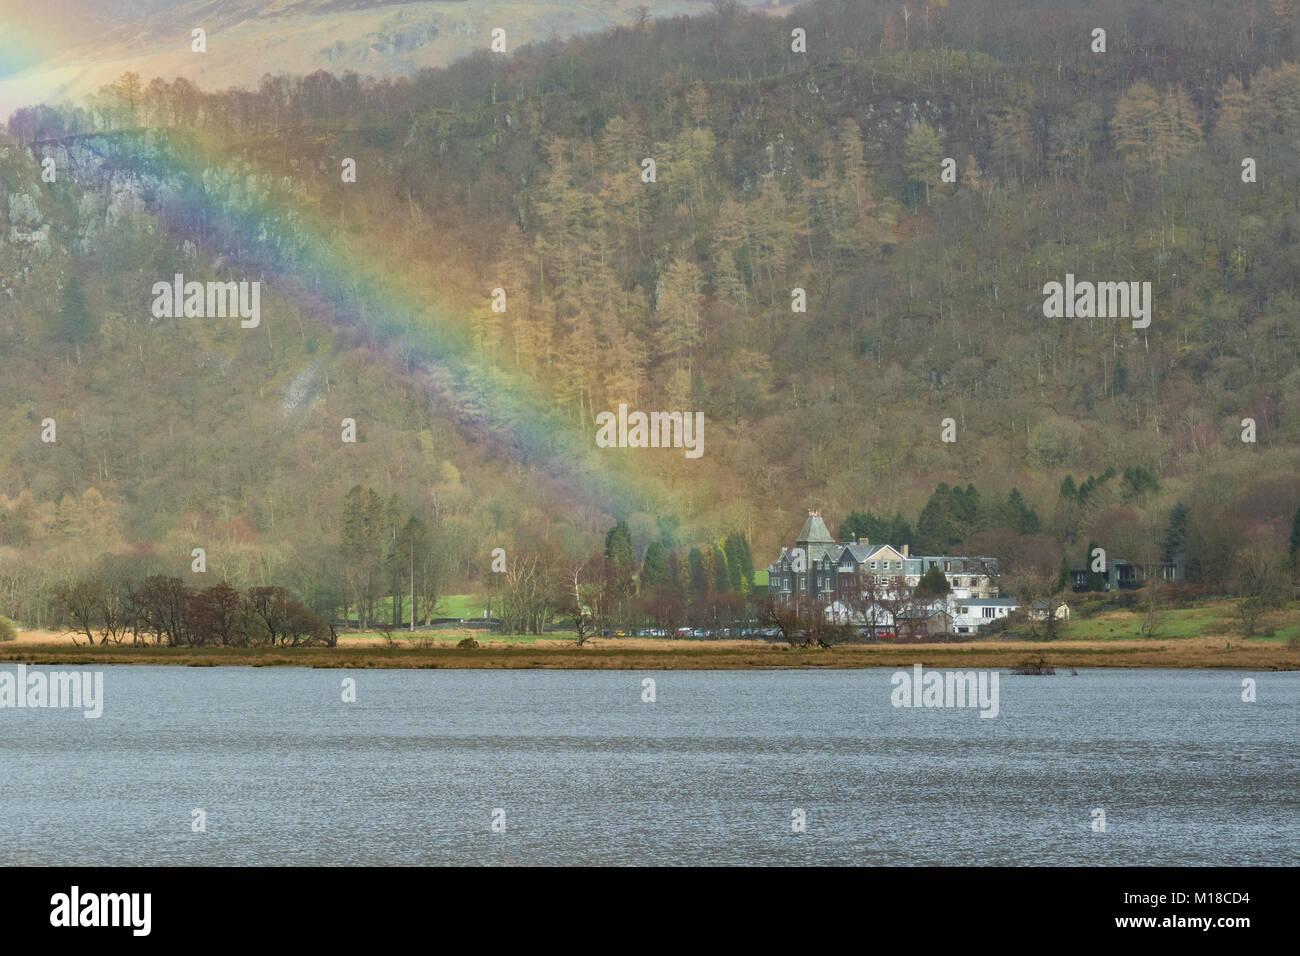 Lodore Falls Hotel, Derwentwater, Lake District, Cumbria, England, - Stock Image